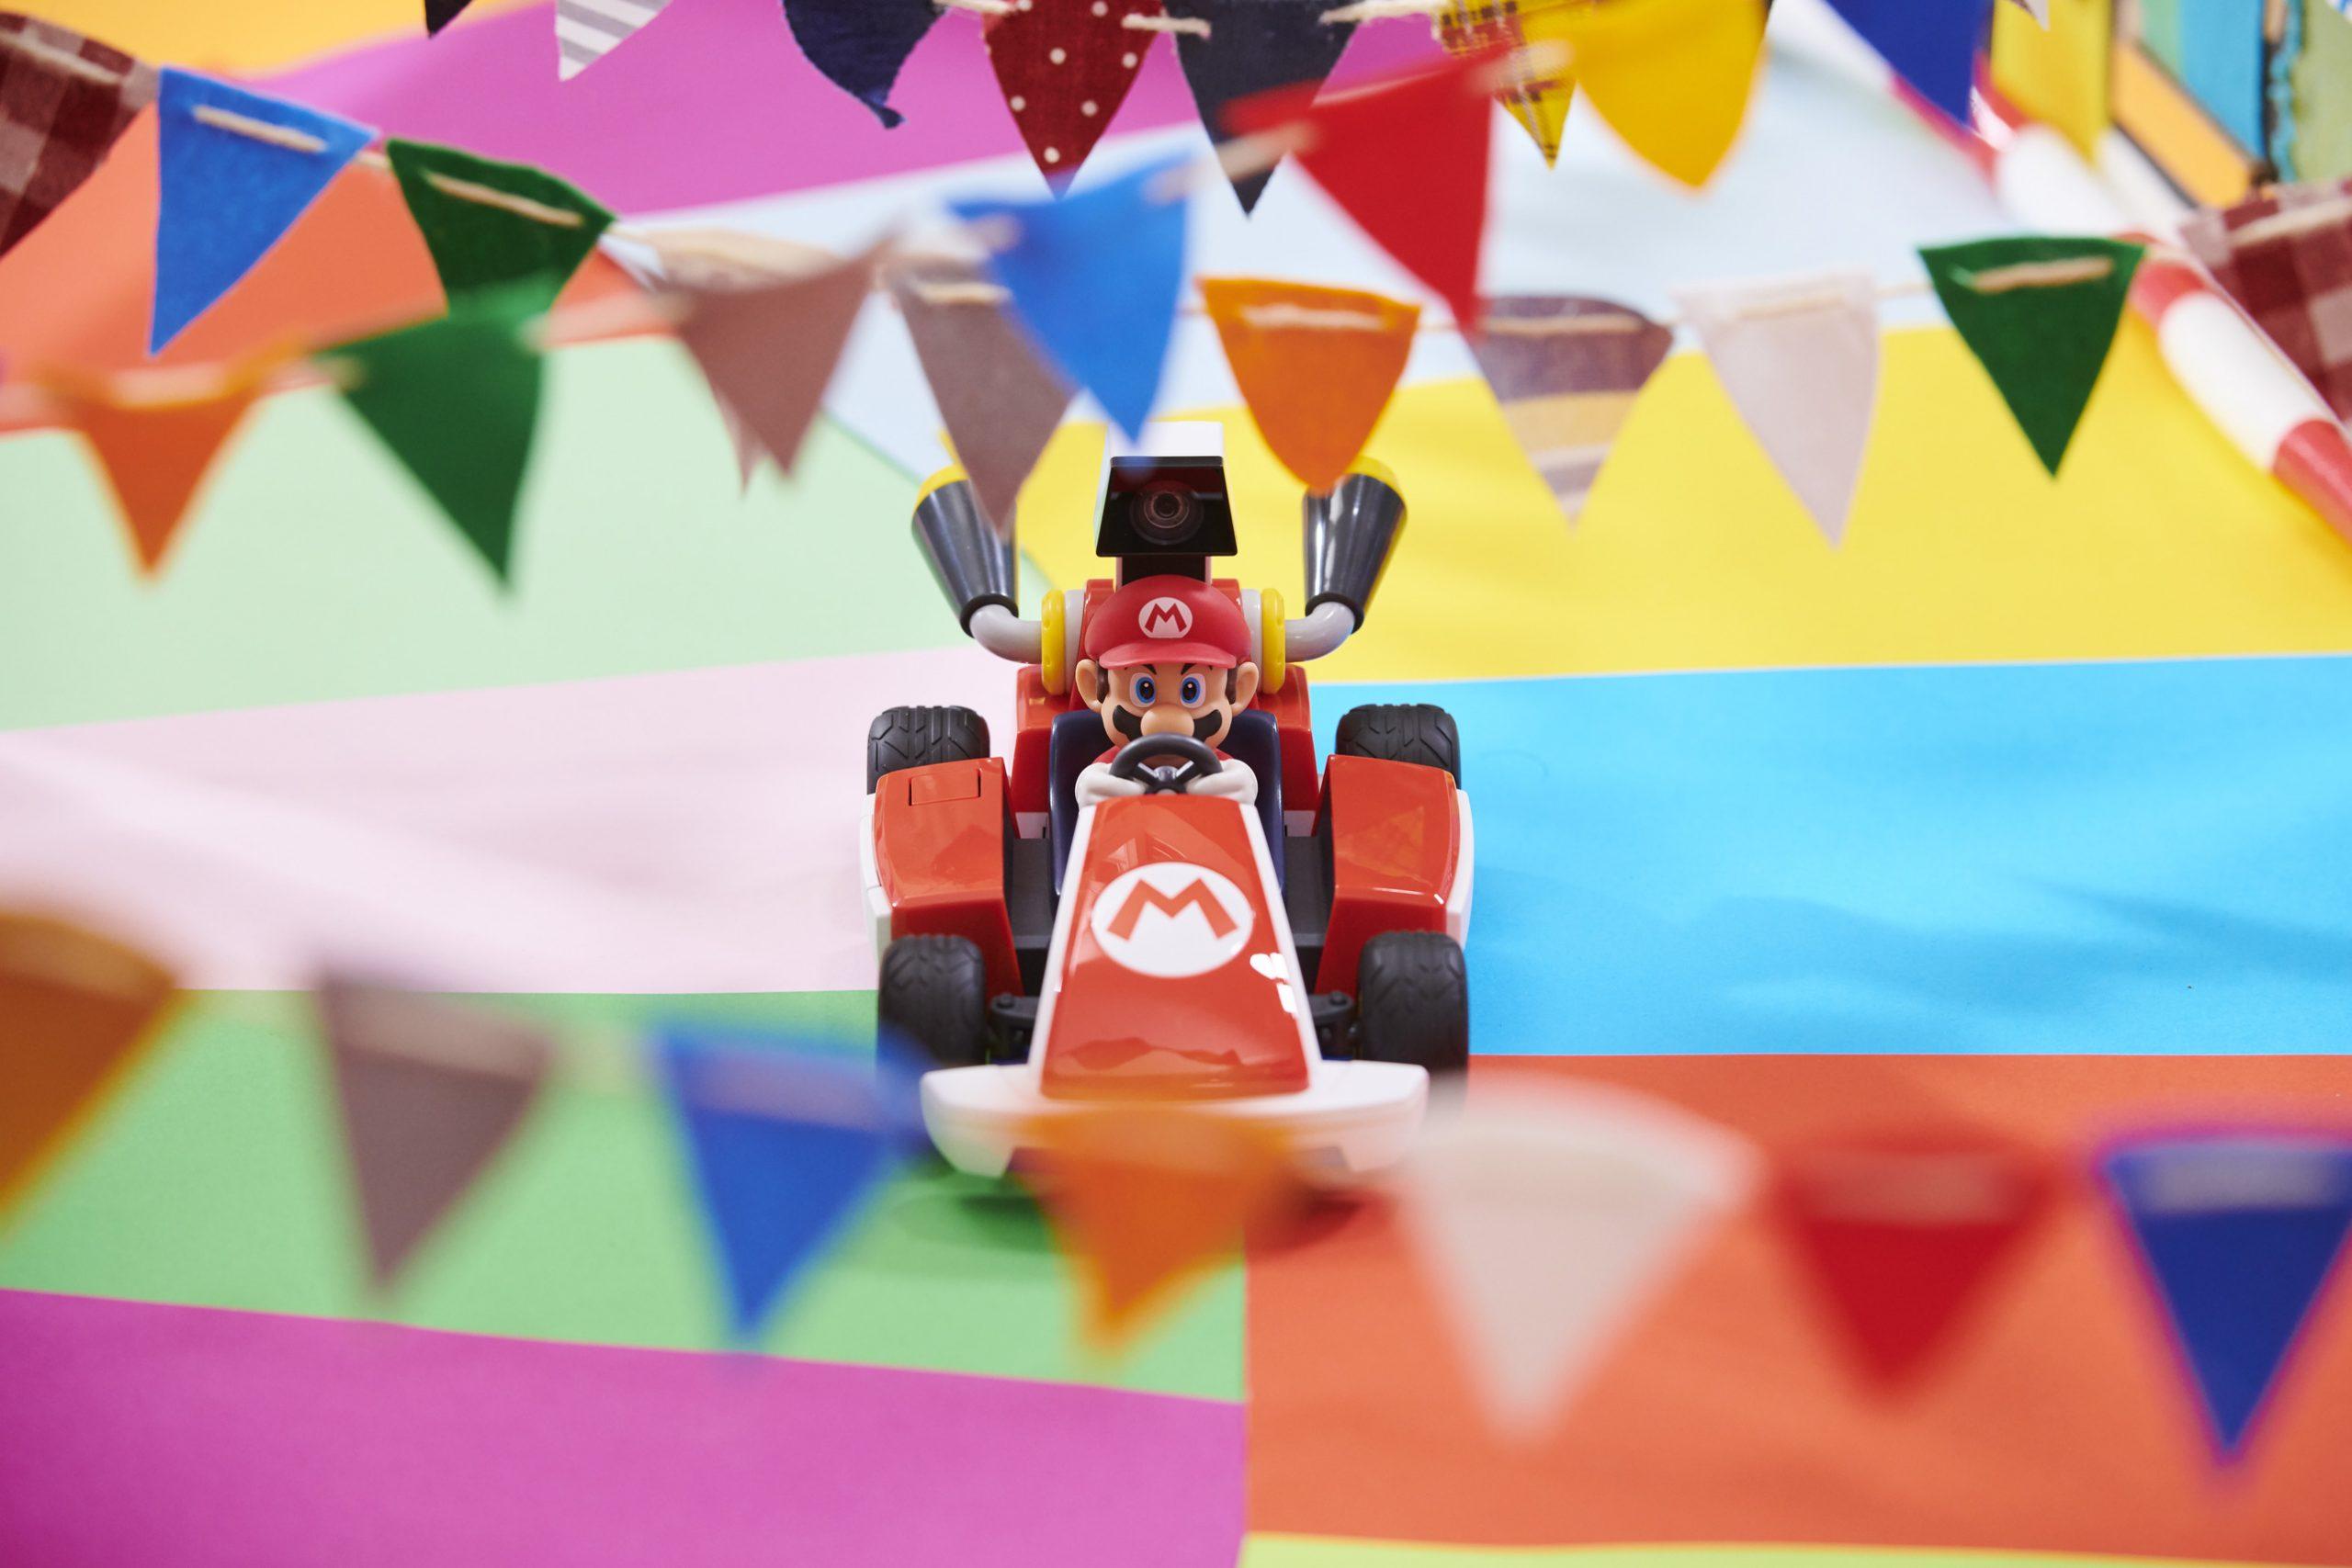 Mario Kart Live: Home Circuit finish line